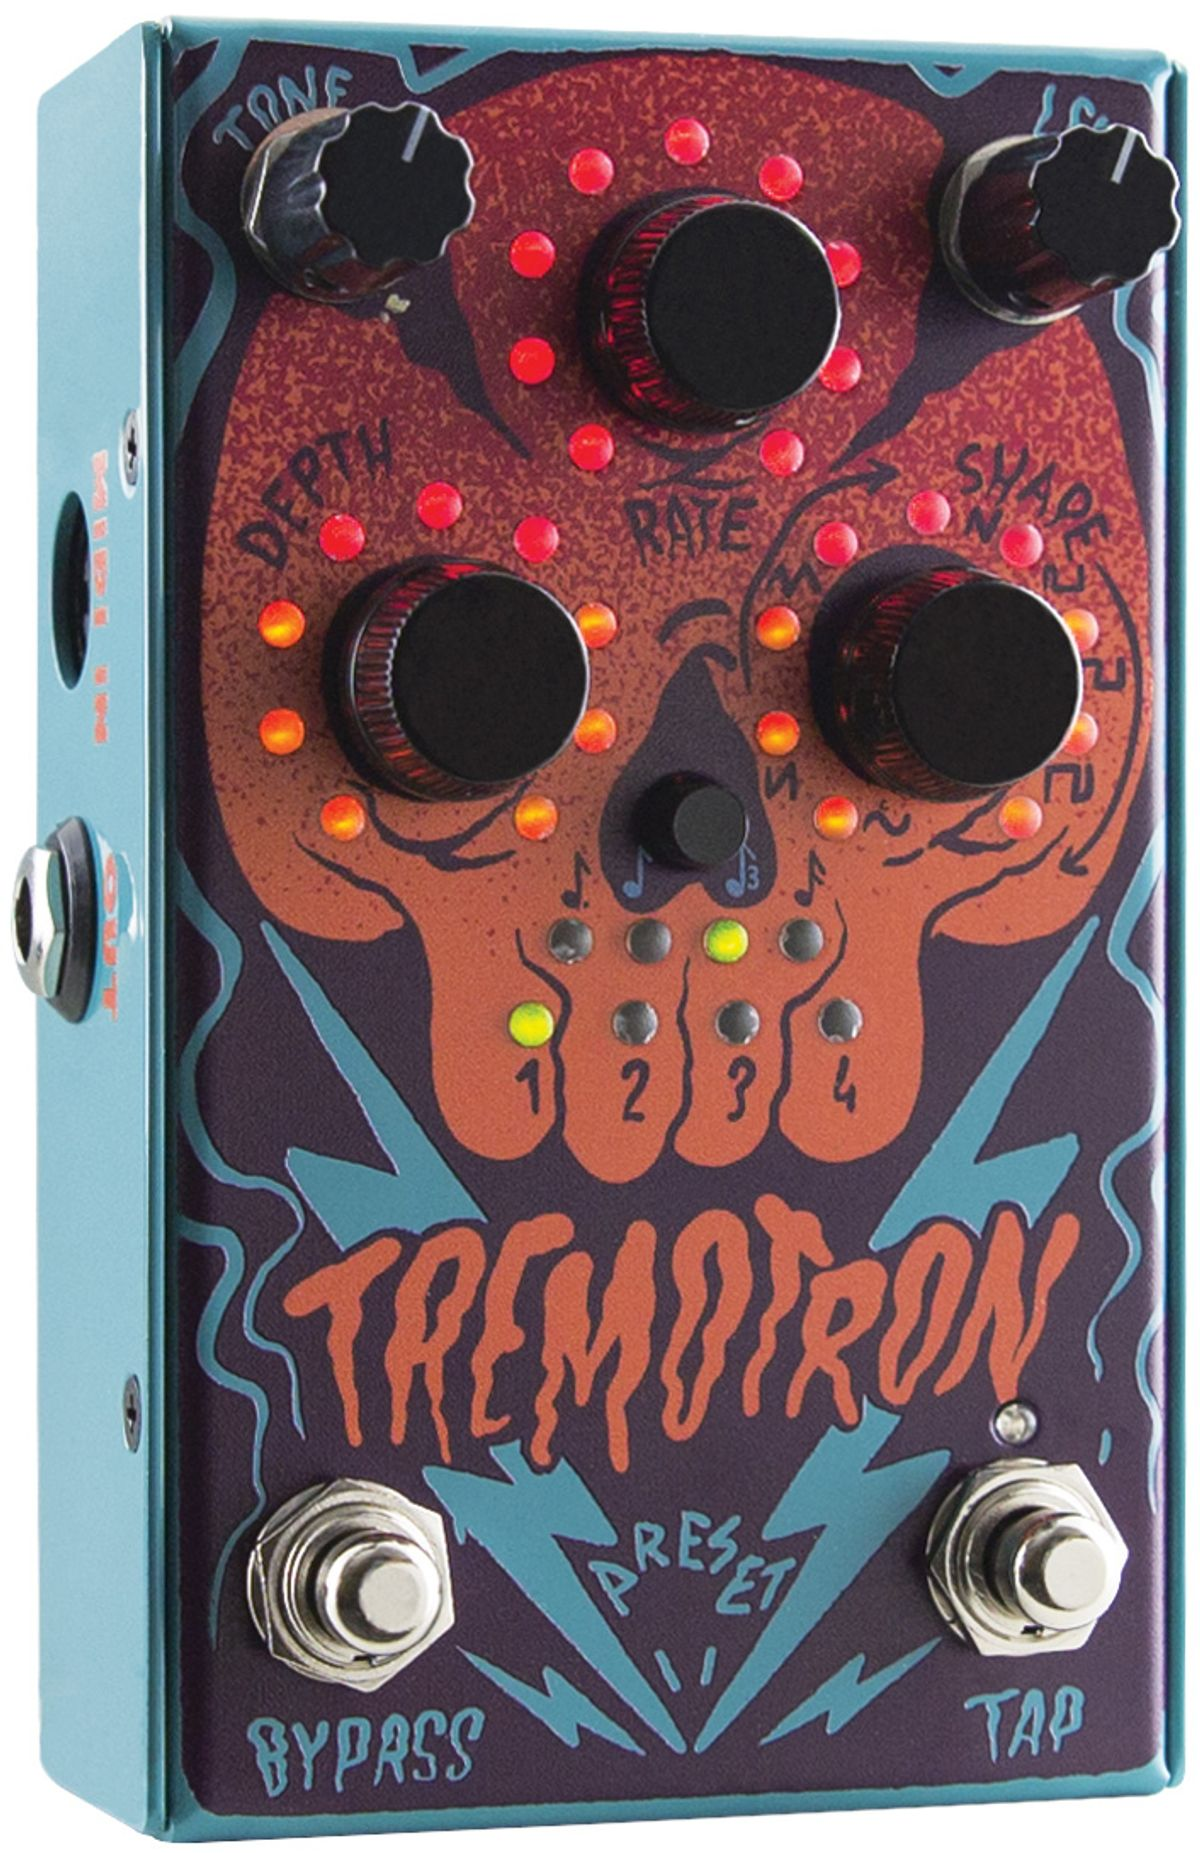 Stone Deaf Tremotron Review